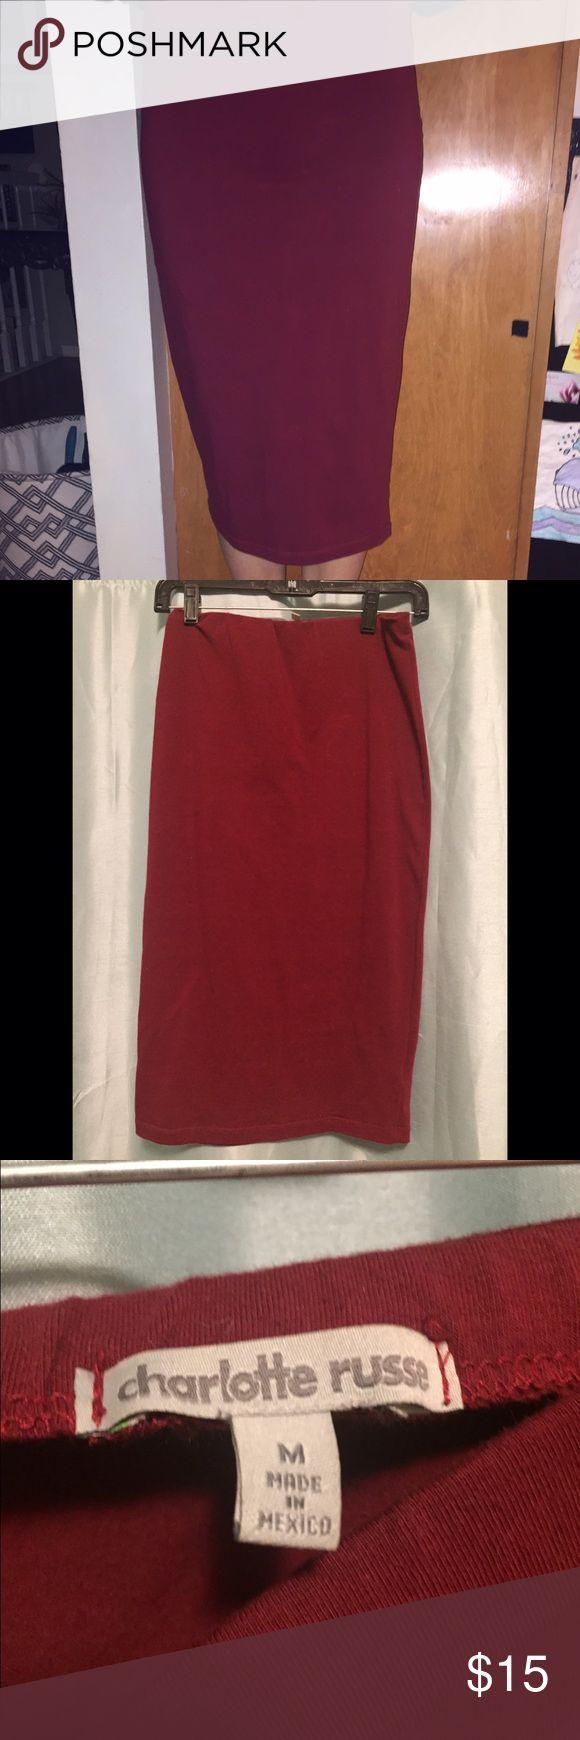 Dark red pencil skirt! Charlotte Russe dark red pencil skirt:)Smoke free home🚫 Charlotte Russe Skirts Pencil